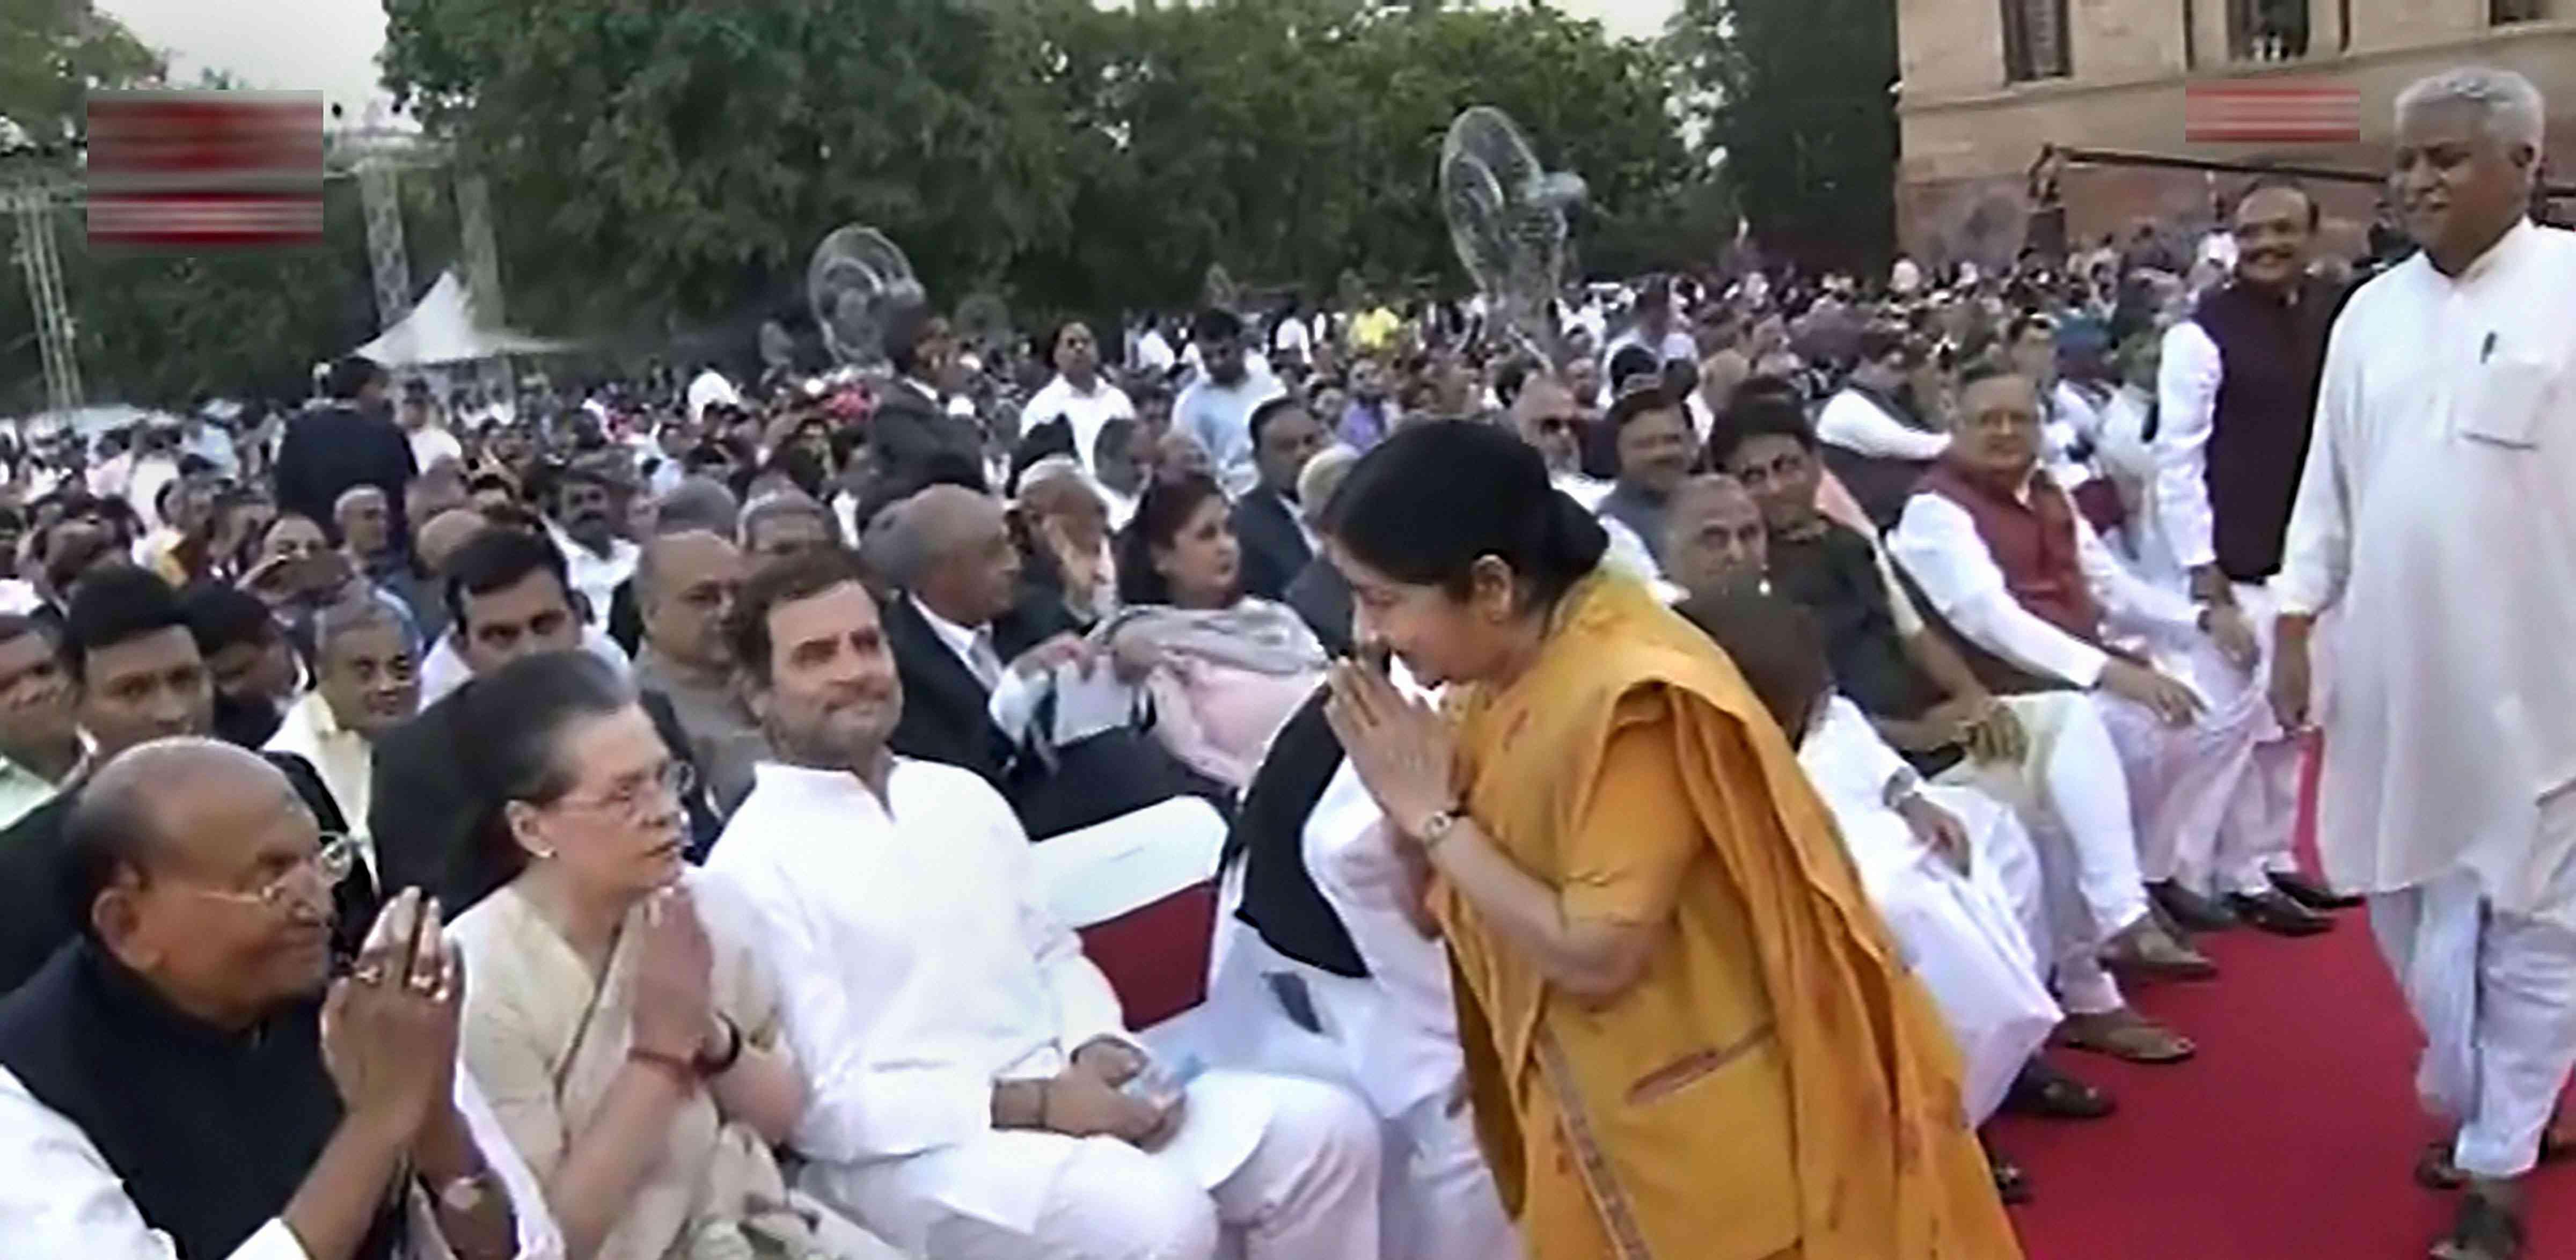 Senior BJP leader Sushma Swaraj exchanges greetings with senior Congress leader Sonia Gandhi and Congress President Rahul Gandhi. (Image Credit: PTI)